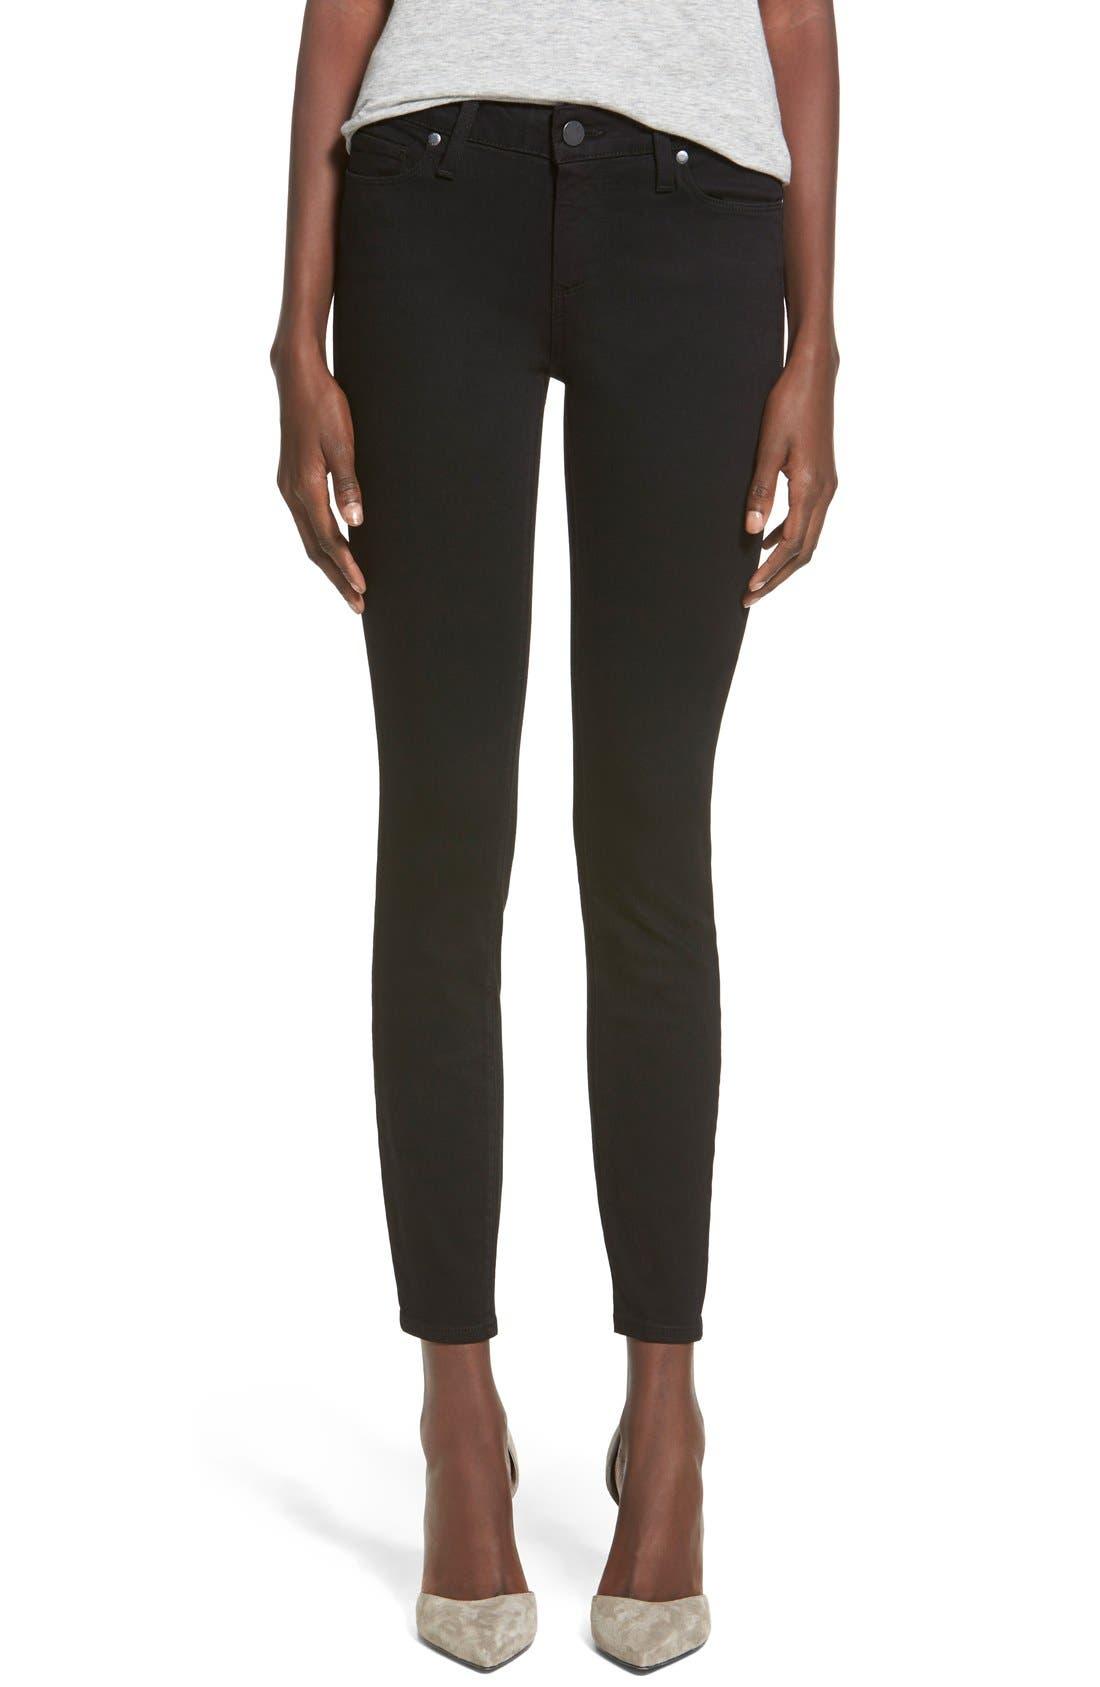 Transcend - Verdugo Ankle Ultra Skinny Jeans,                         Main,                         color, Black Shadow